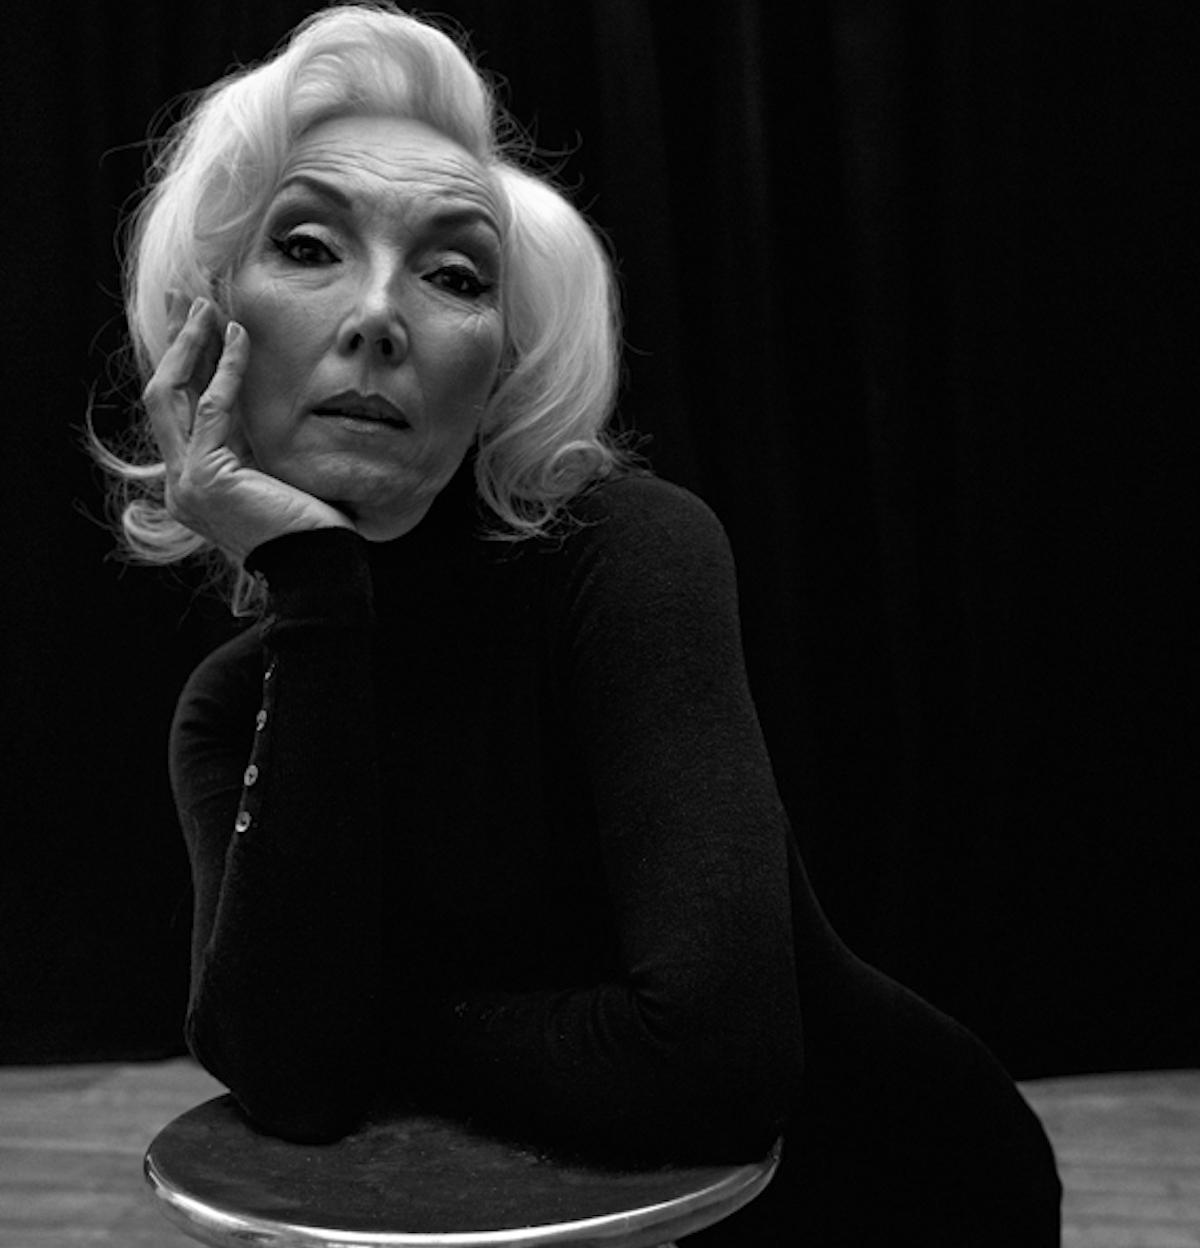 Photograph of Mrs Robinson Management model 'Valerie', by Natalia Lipchanskaya